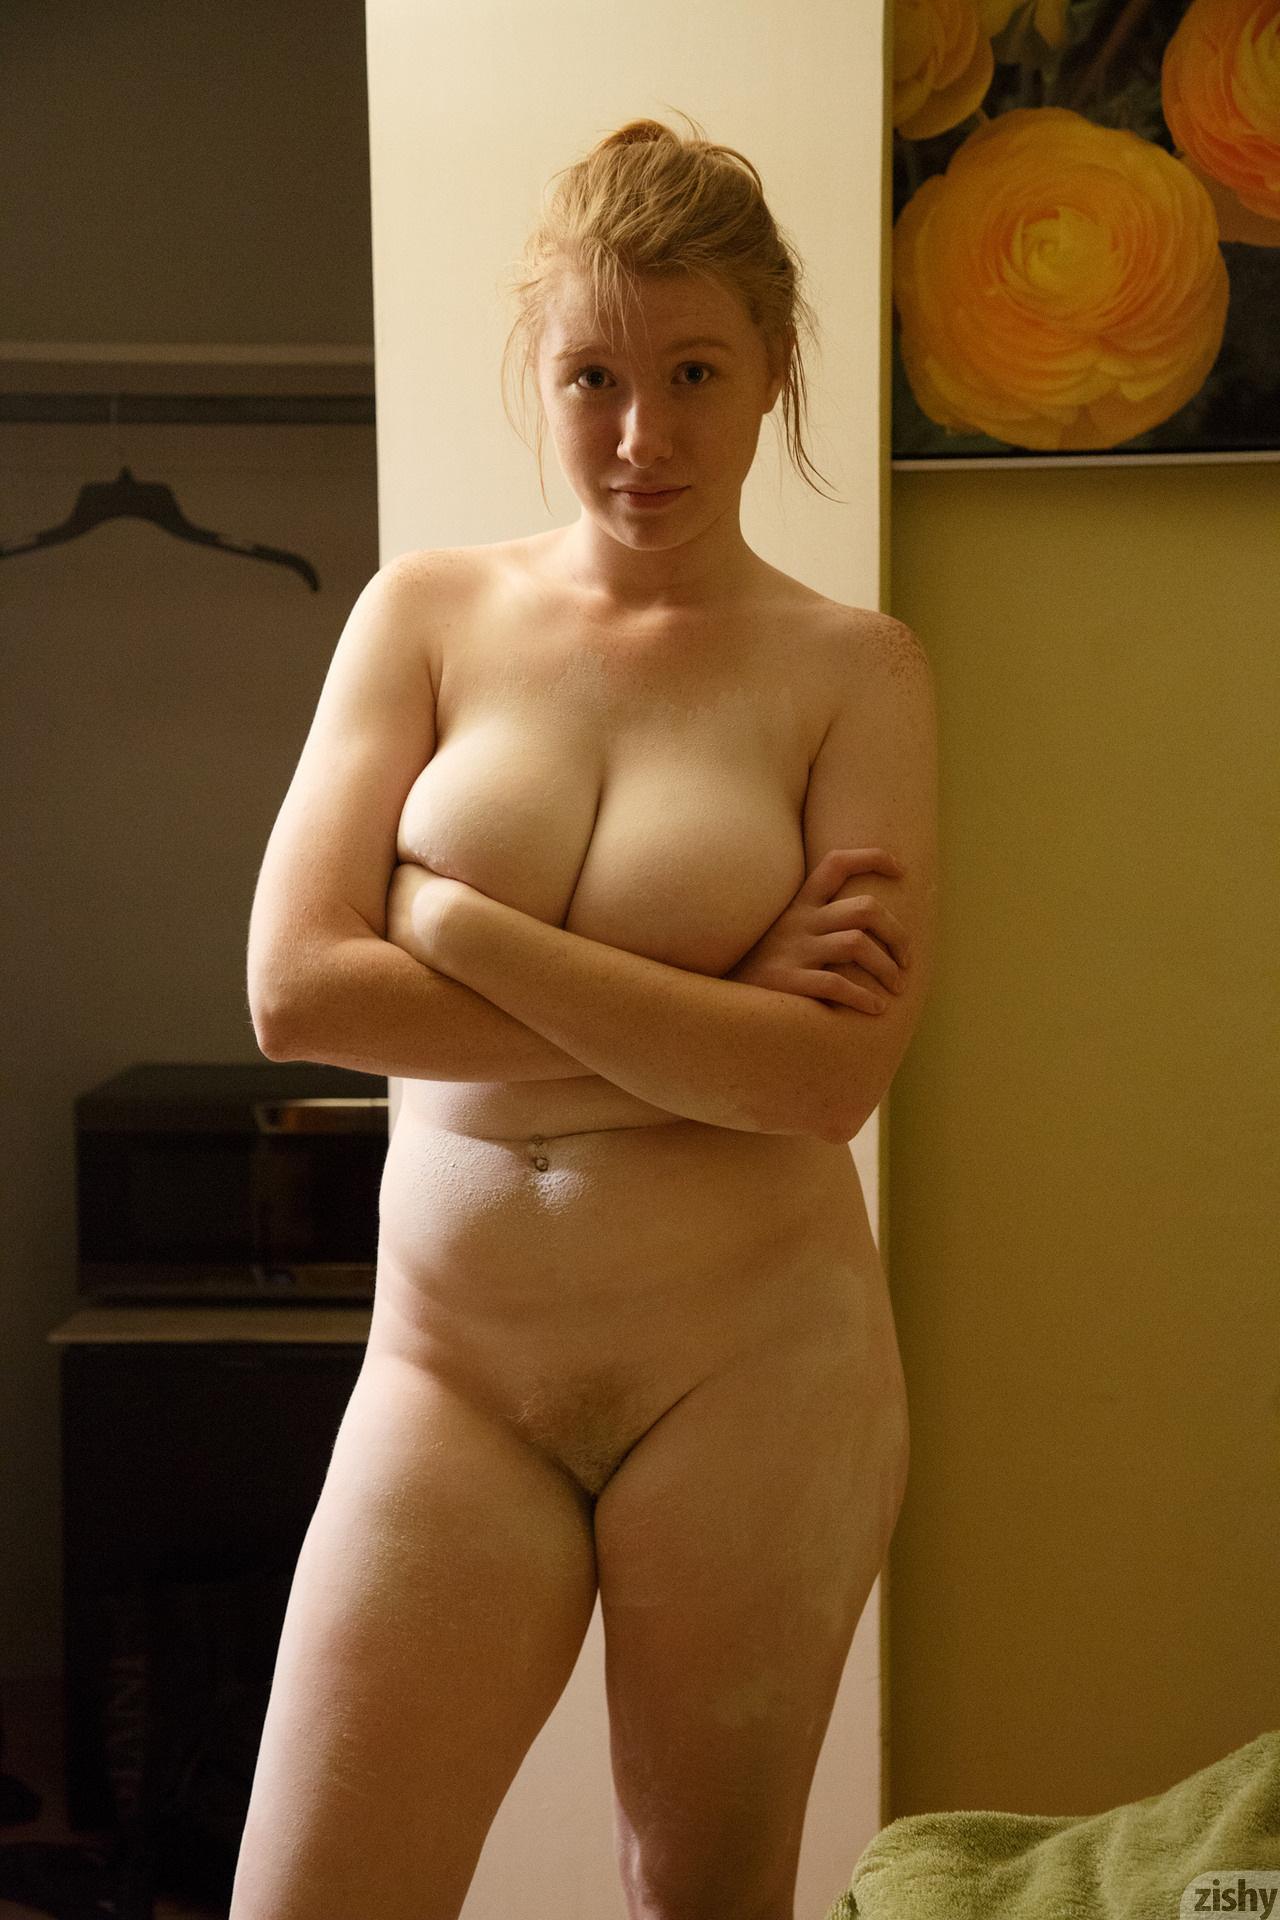 Irelynn Dunham Shake And Bake Zishy (36)